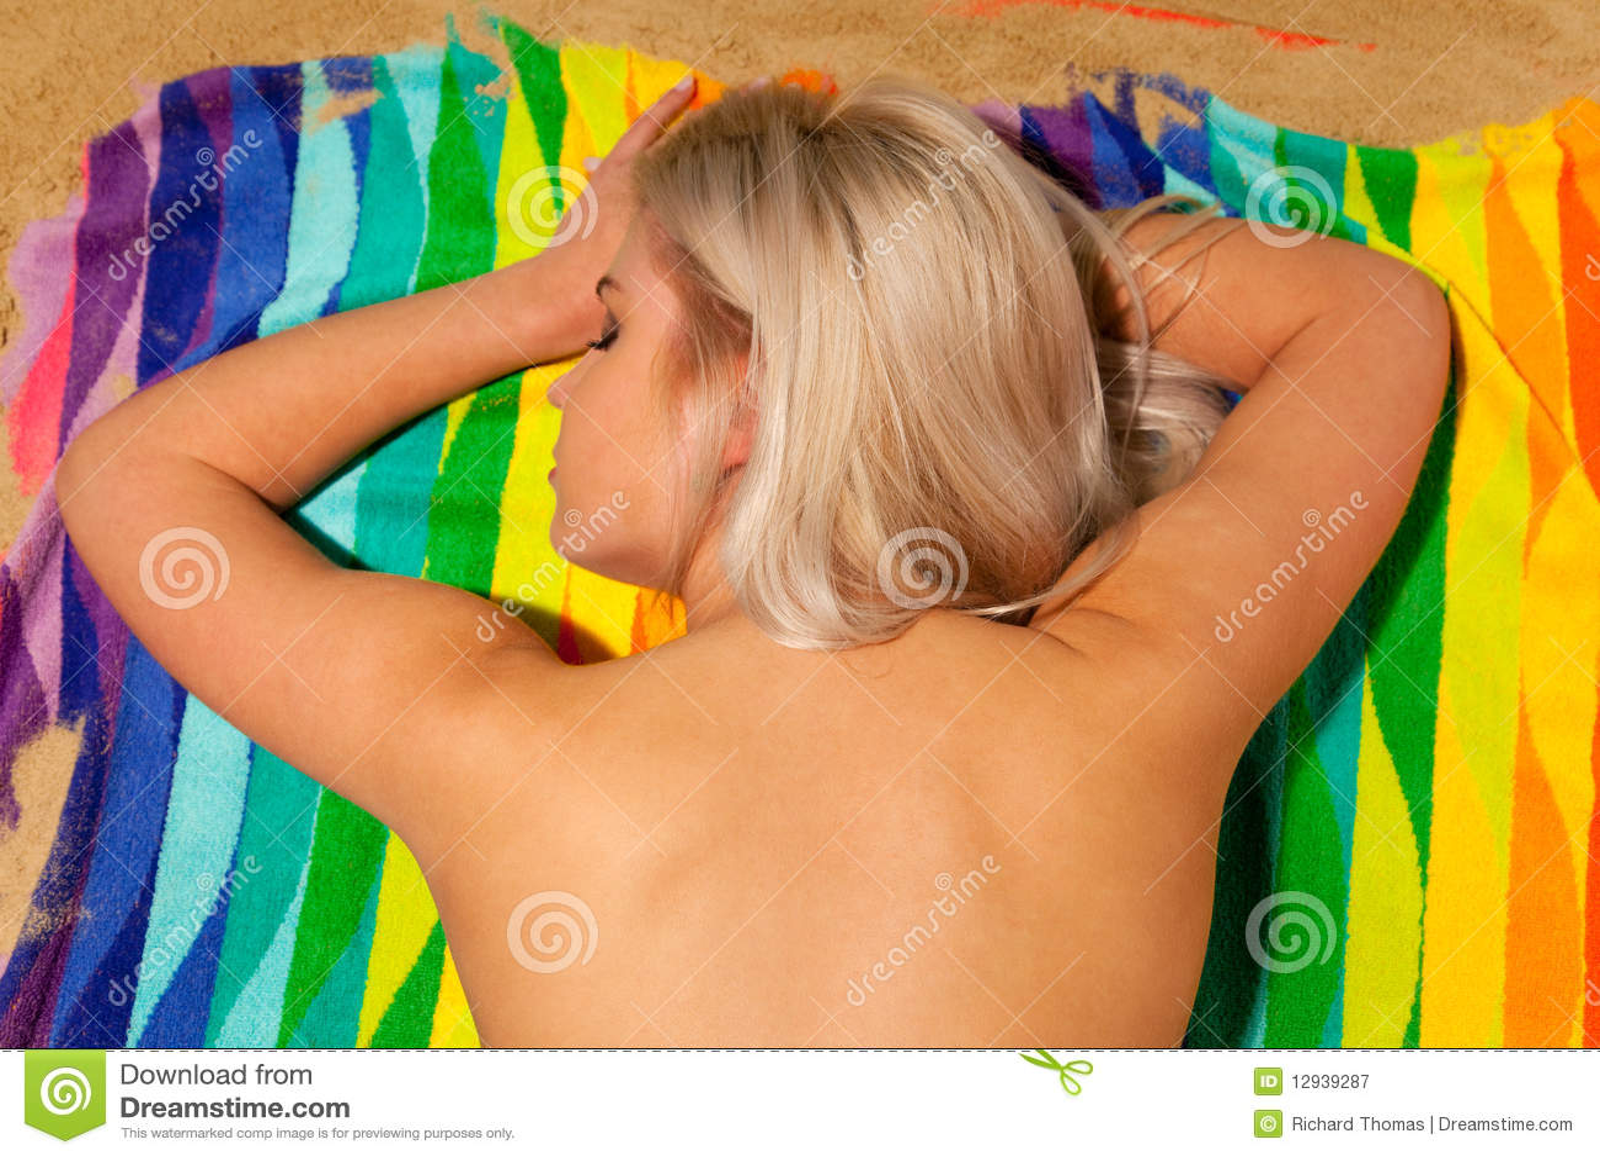 Blond woman sunbathing topless